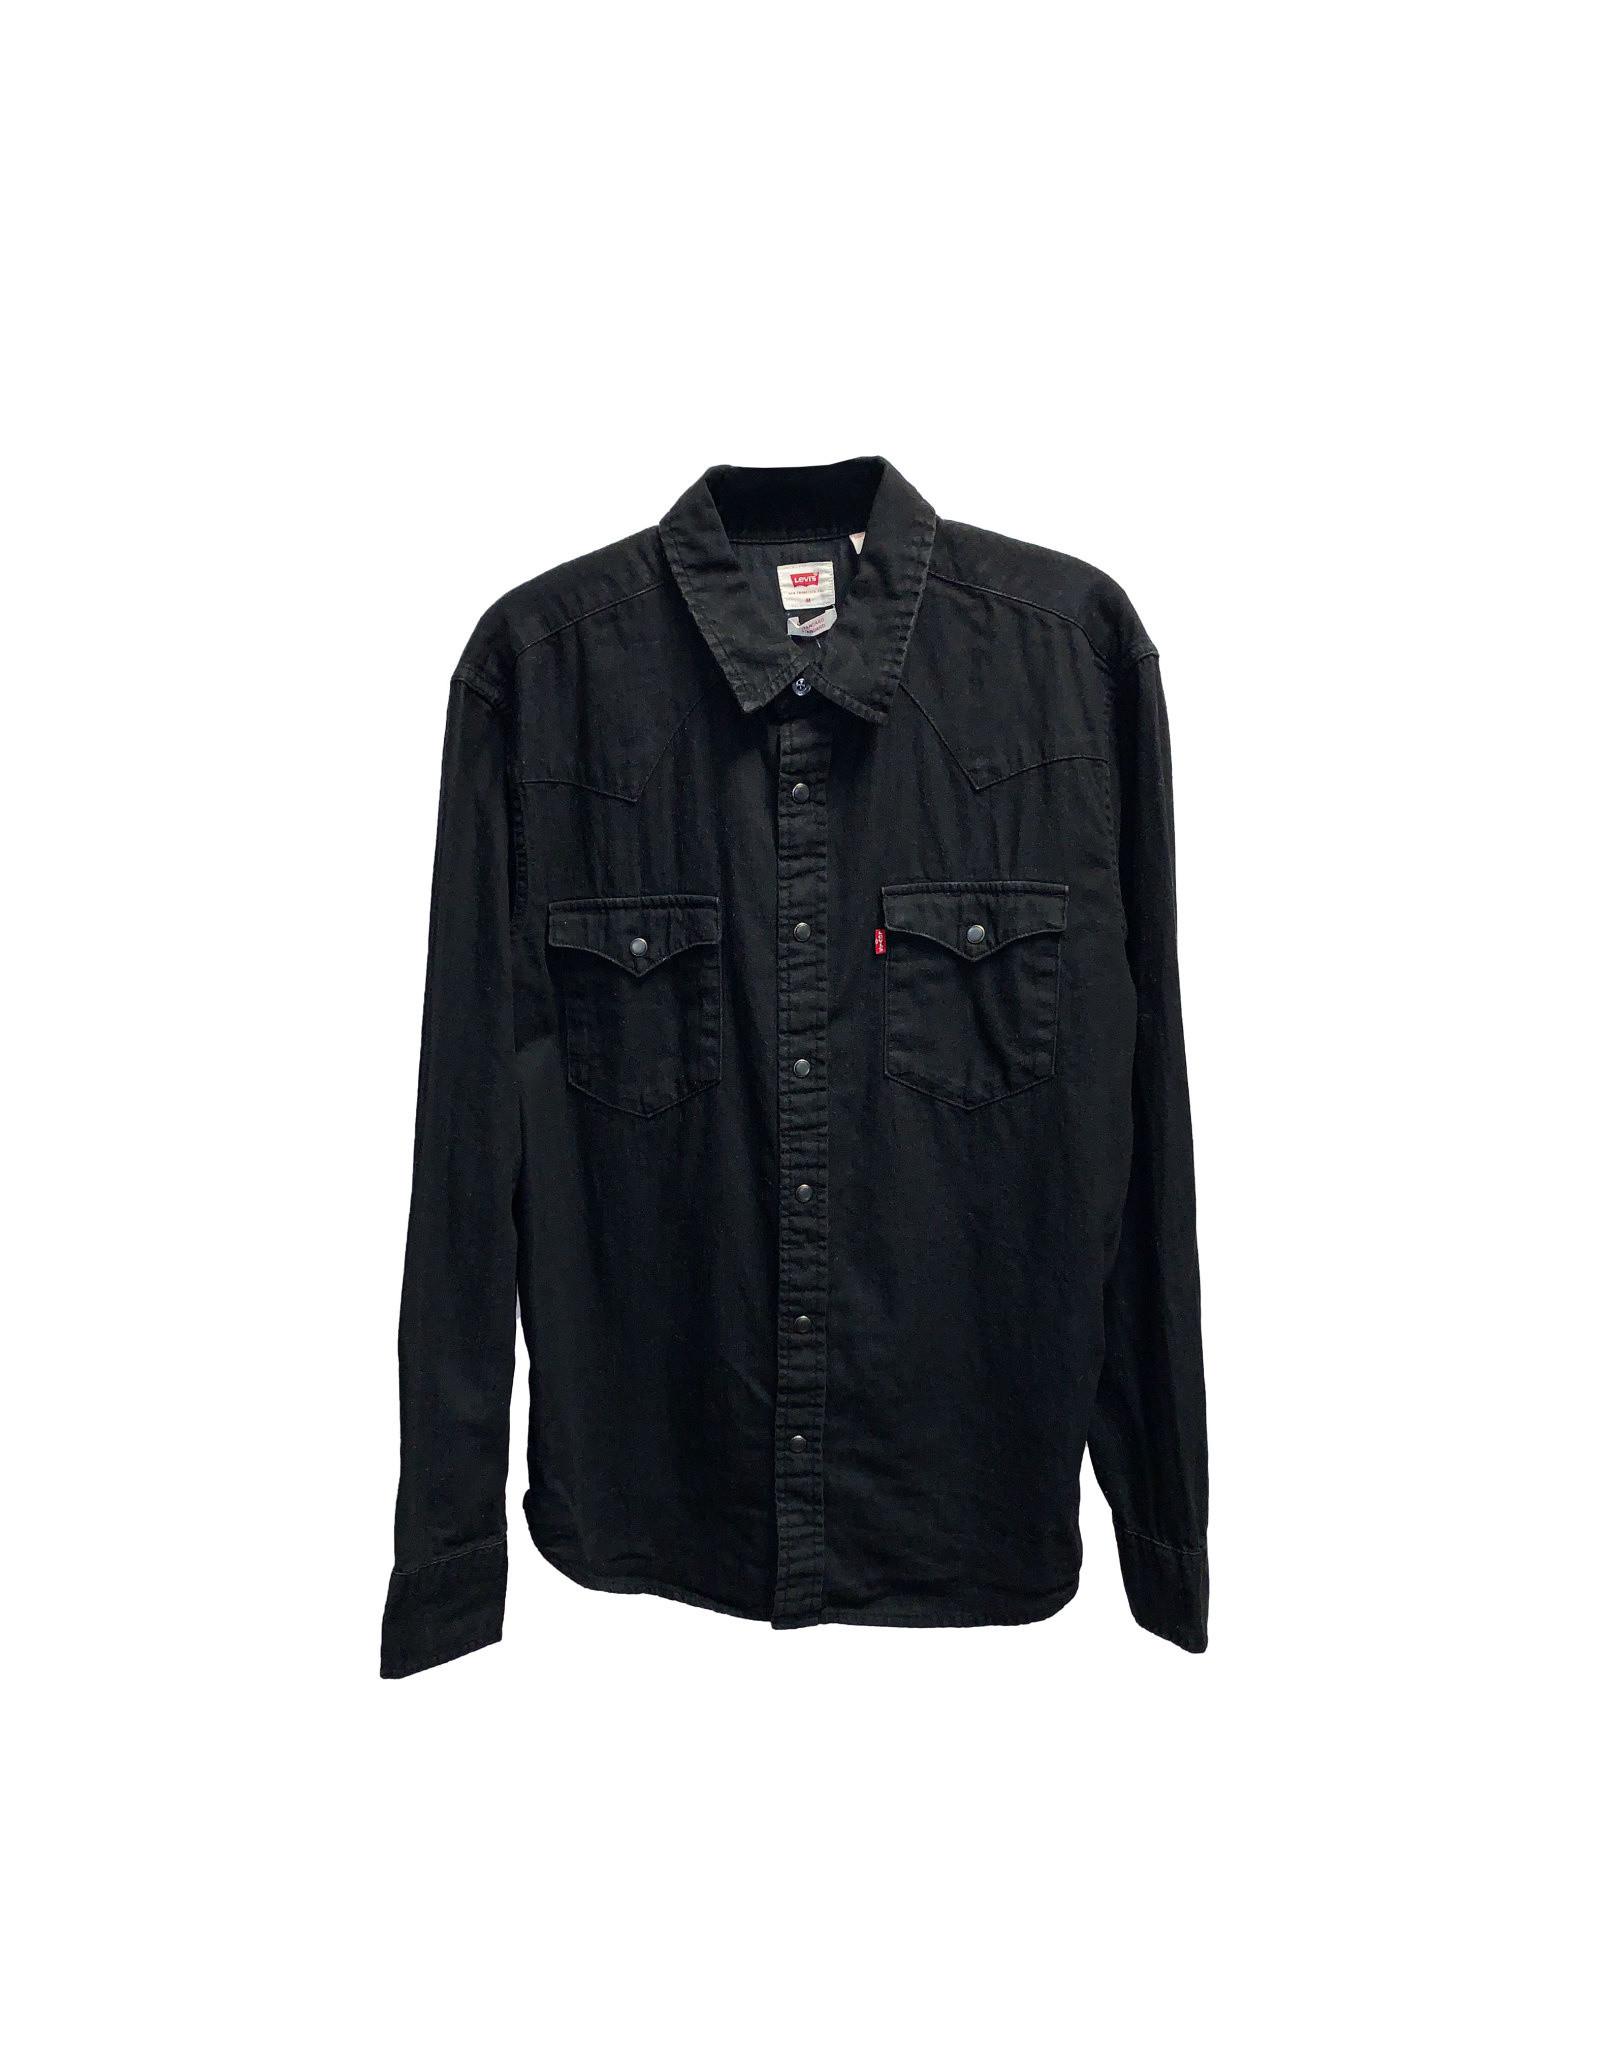 Levi's Levi's Black Long Sleeve  Size M